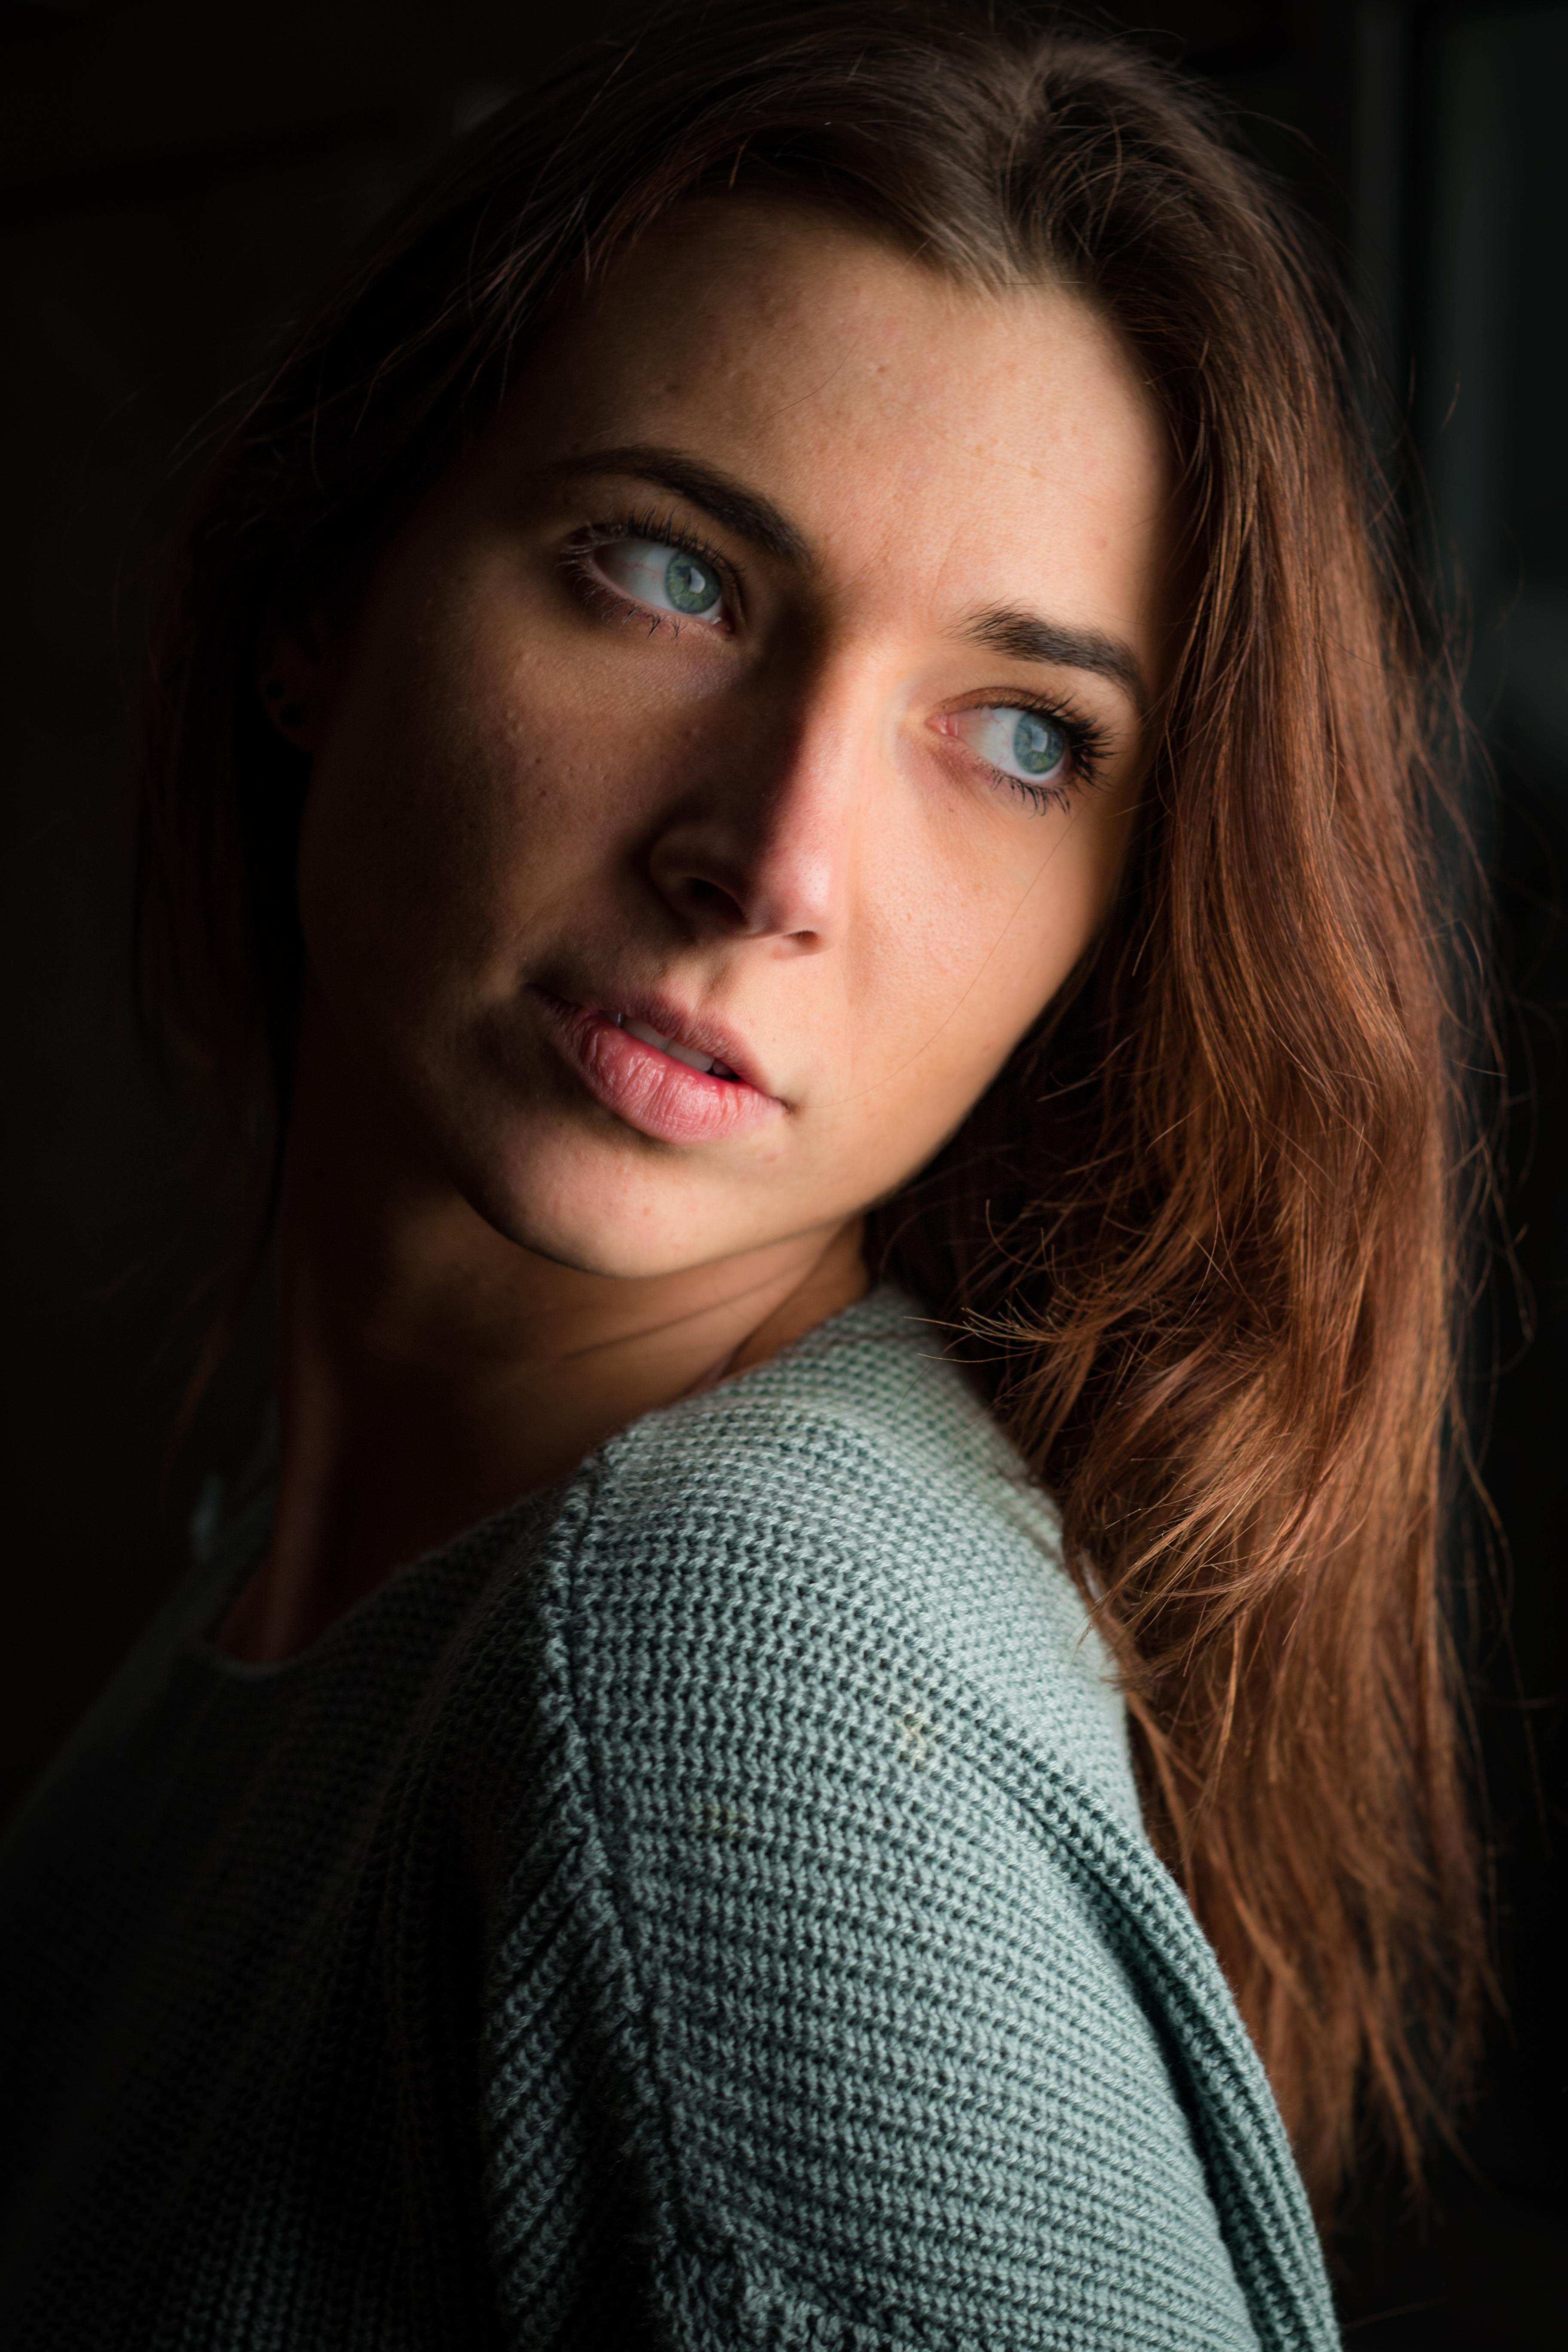 photographe maurienne savoie chambér